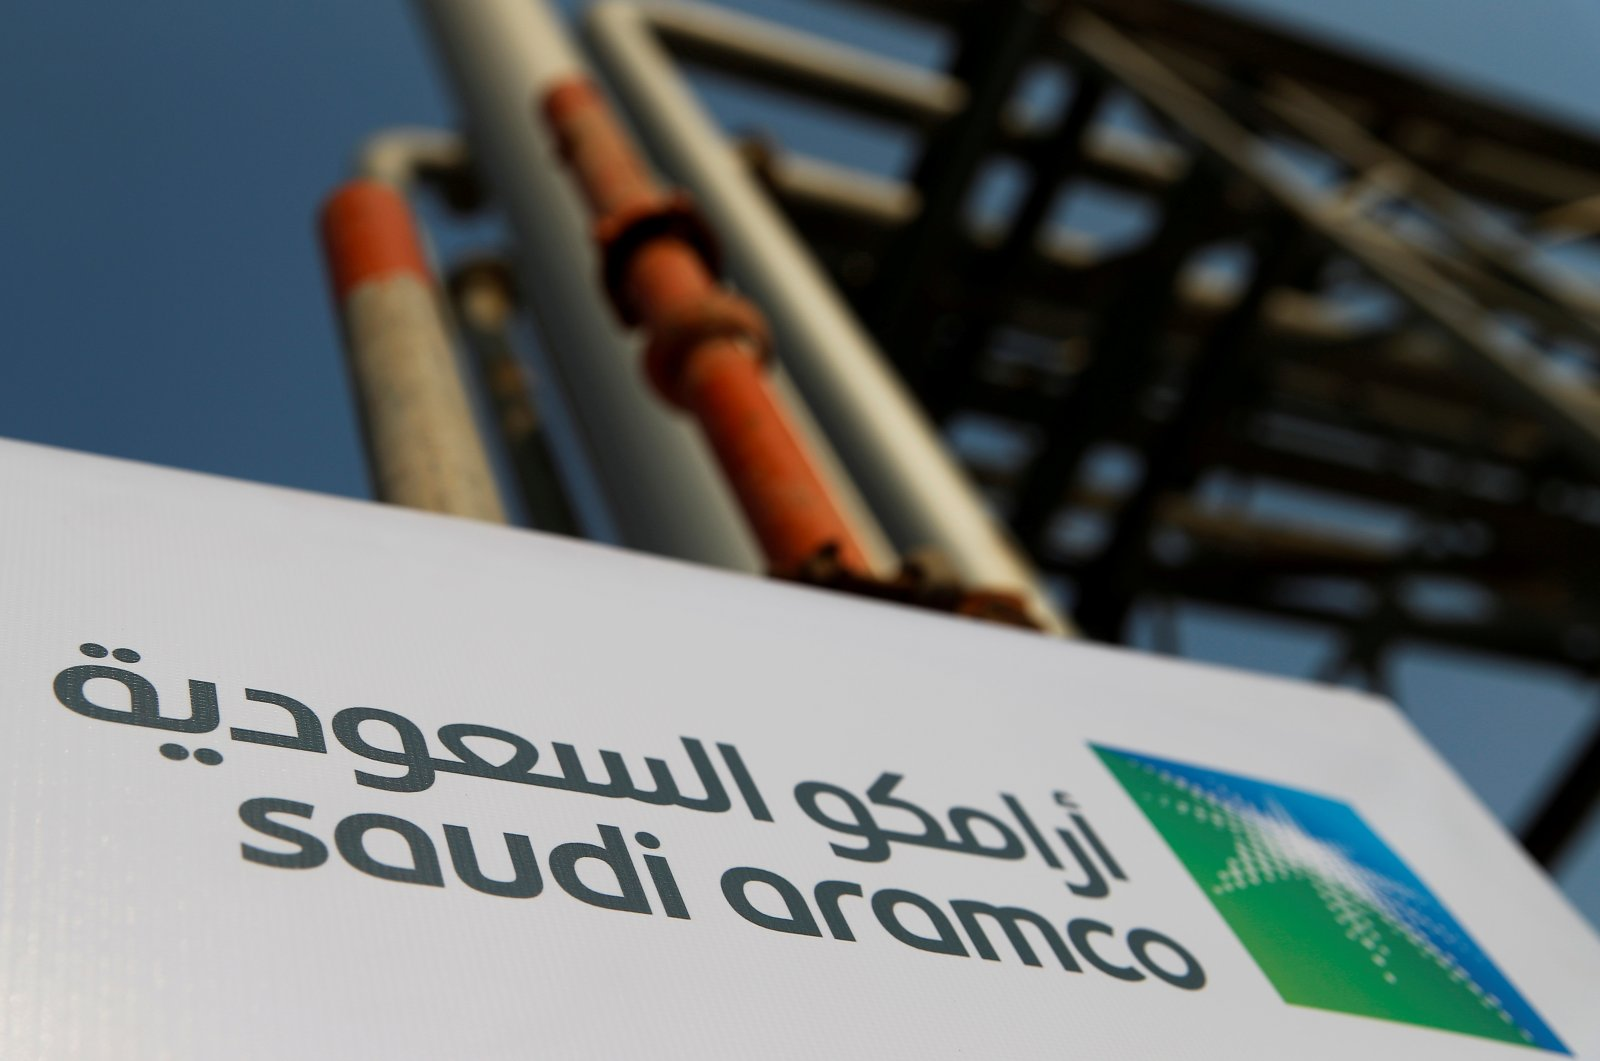 Saudi Aramco logo is pictured at the oil facility in Abqaiq, Saudi Arabia, Oct. 12, 2019. (Reuters Photo)